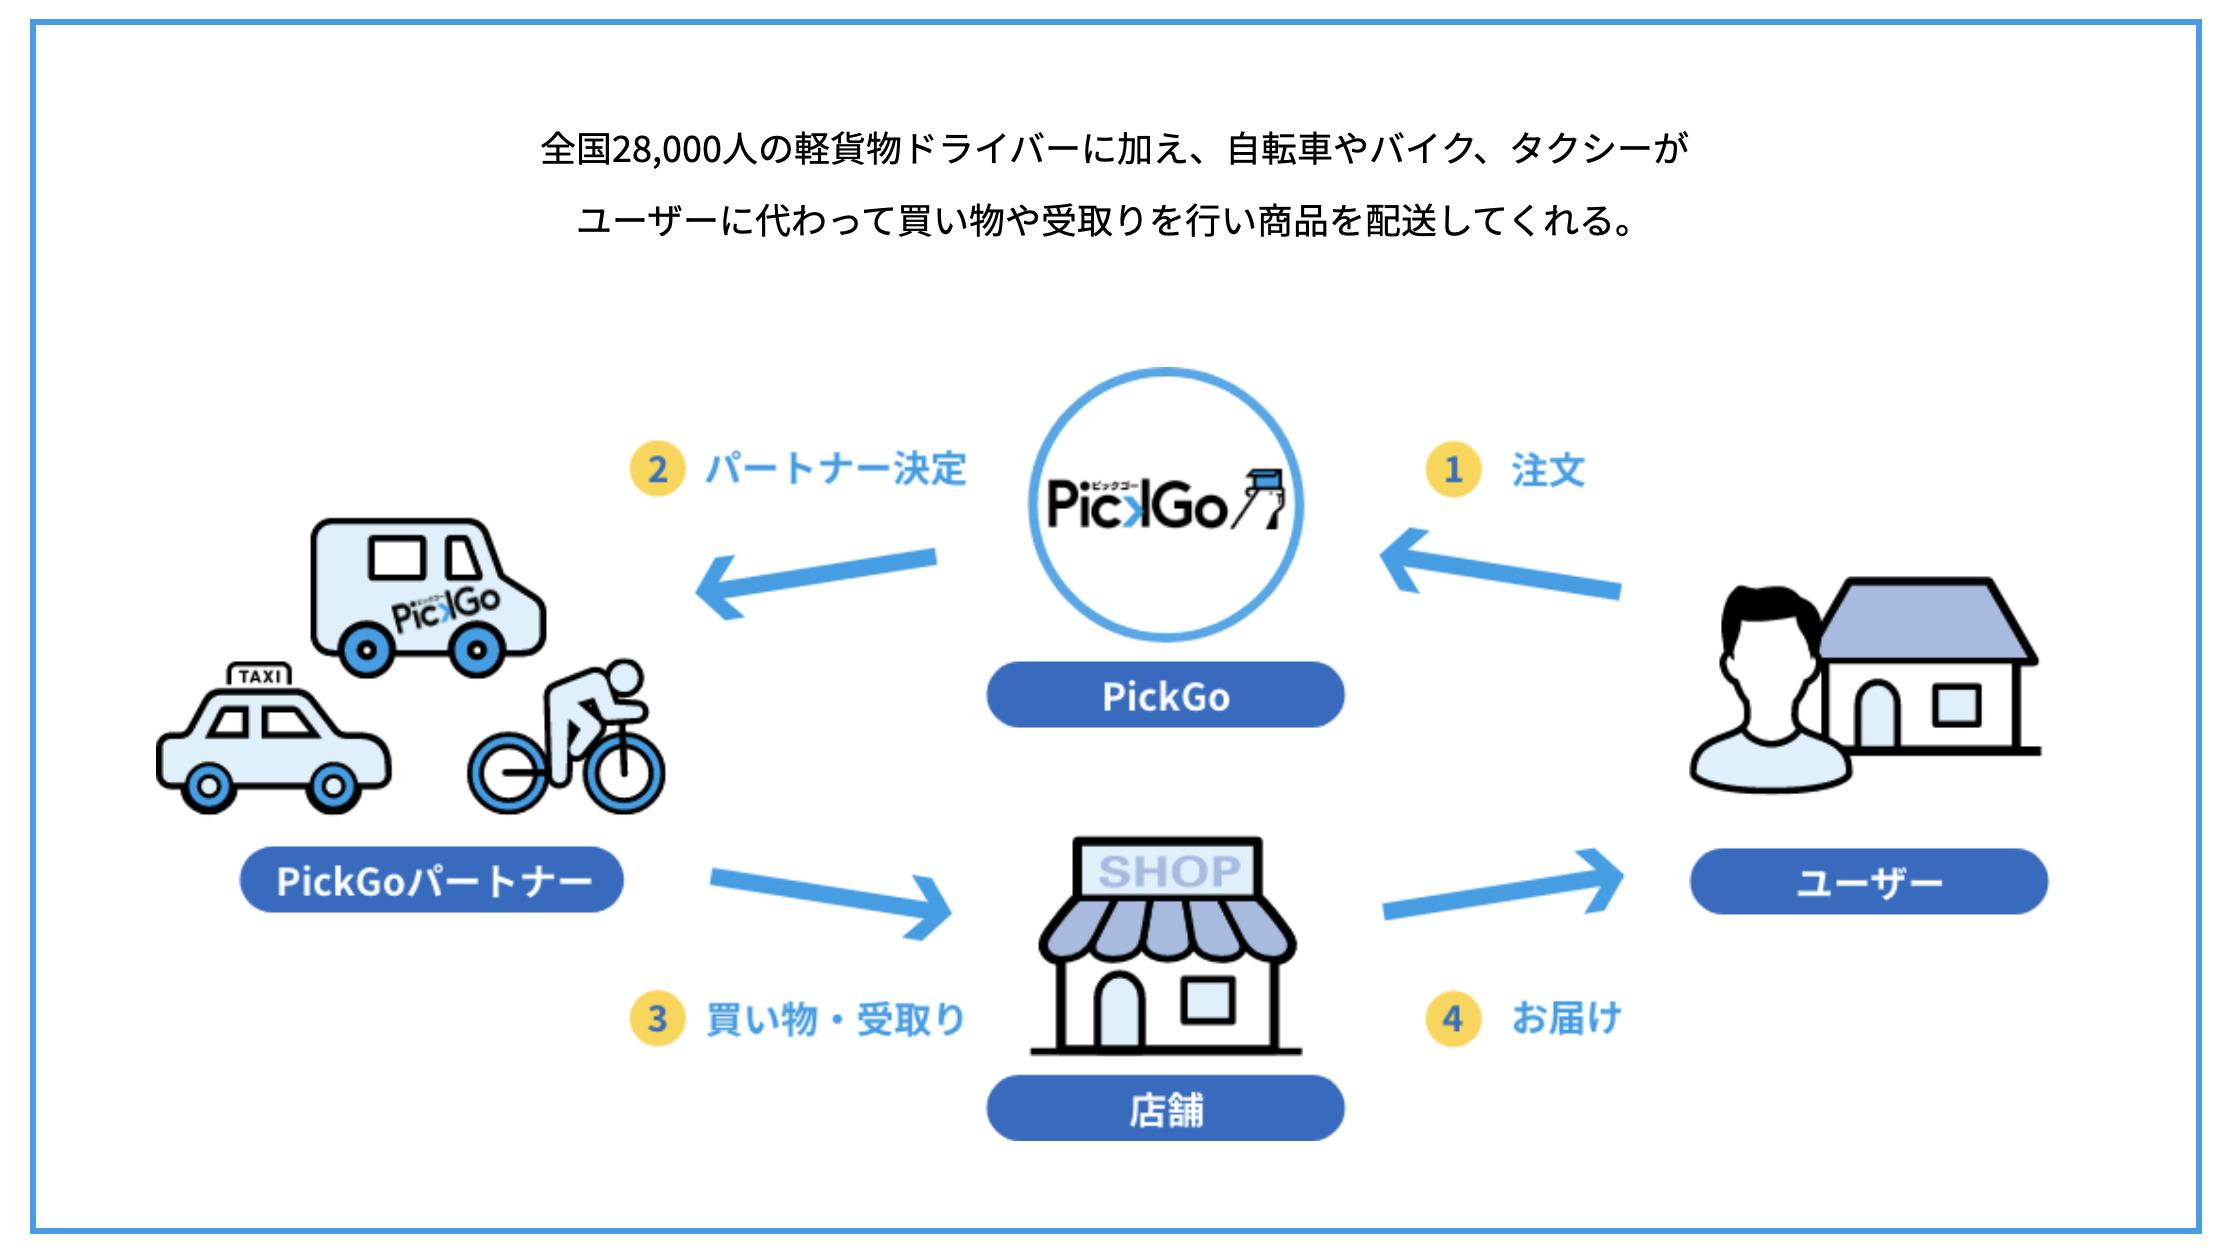 PickGo(ピックゴー)の配達員(バイク・自転車パートナー)の仕事